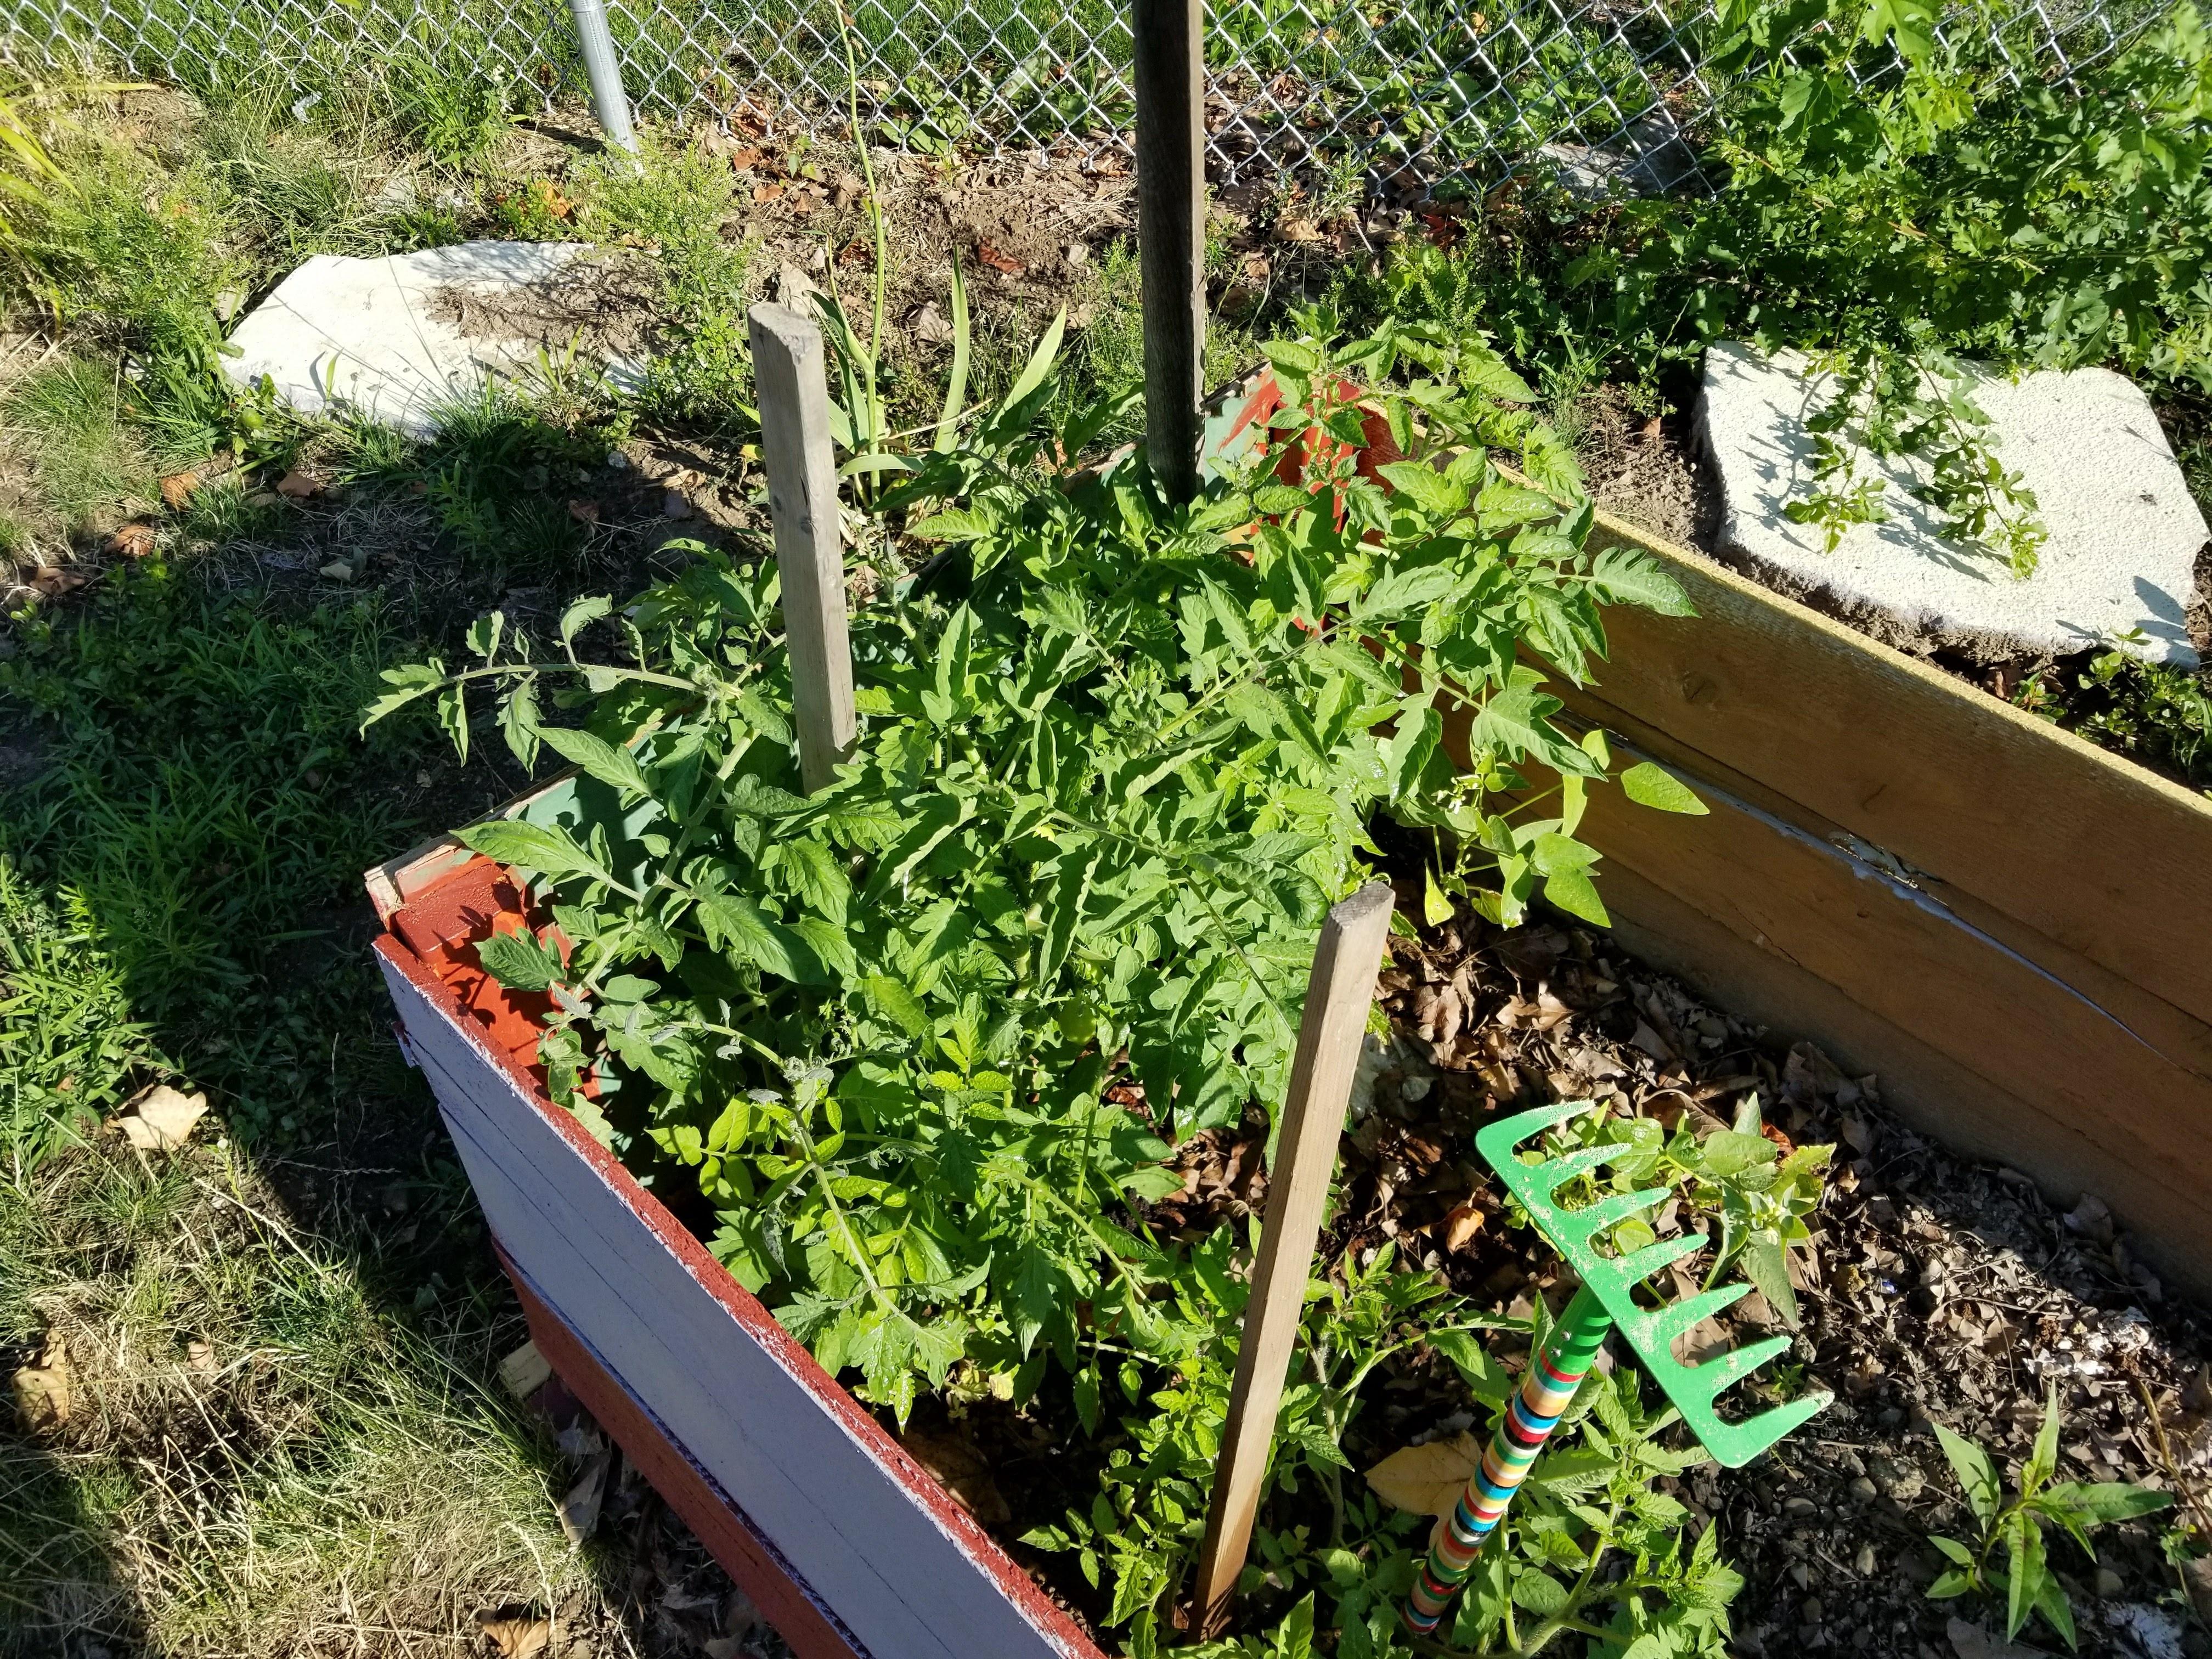 https://0201.nccdn.net/4_2/000/000/07a/dbb/tomatoes-4032x3024.jpg